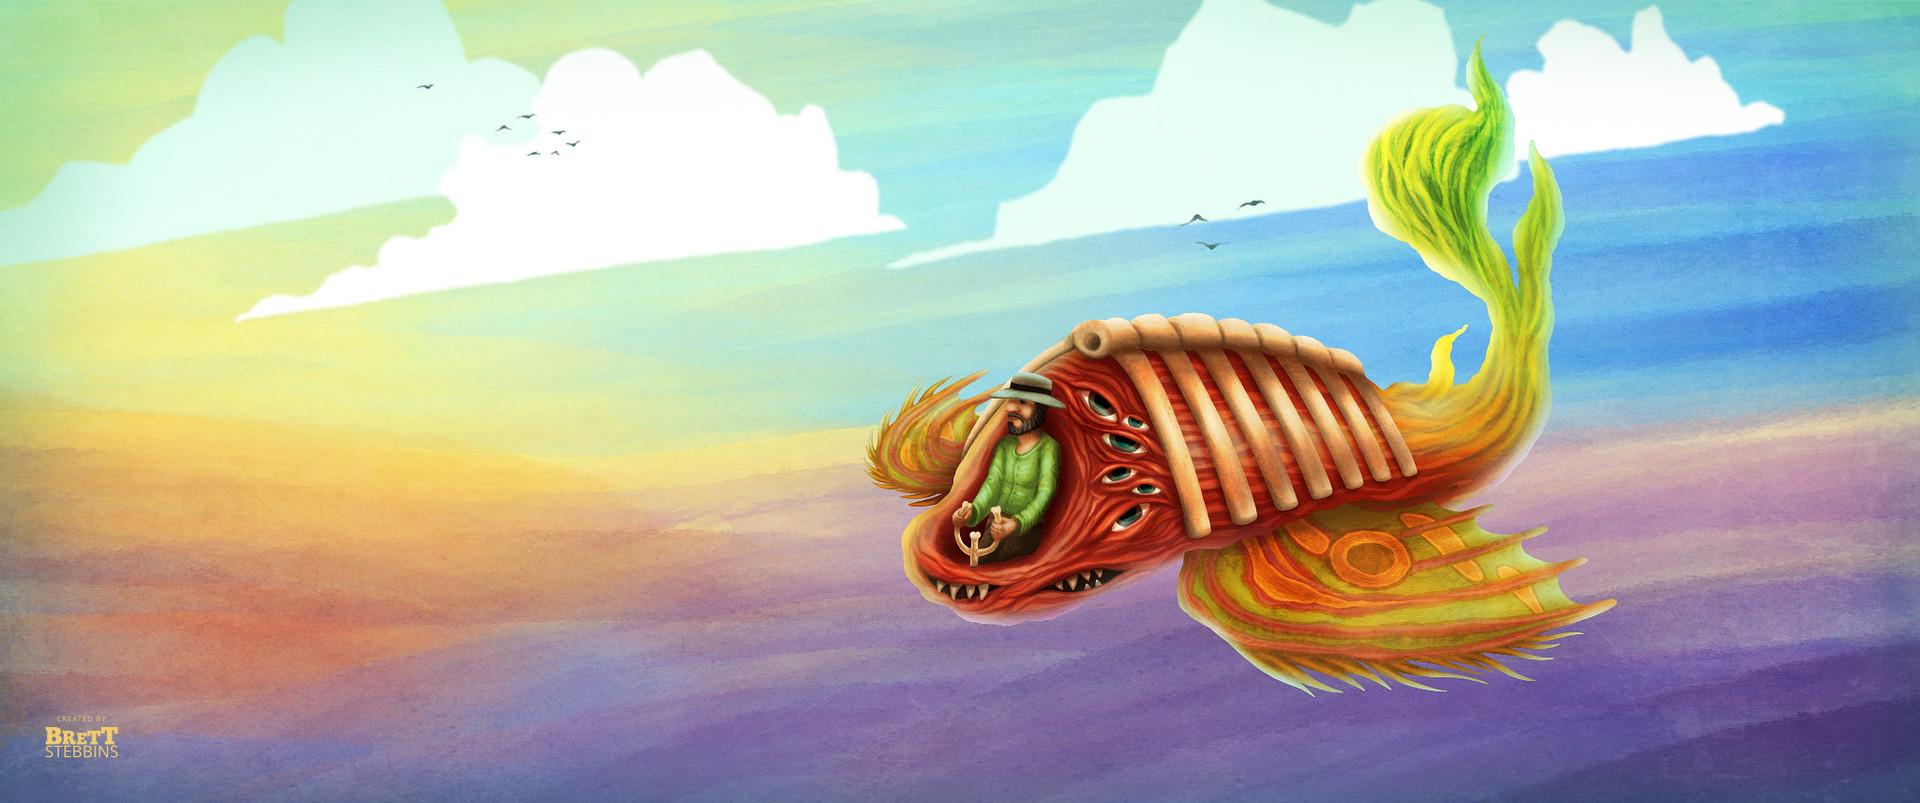 Brett stebbins propellosaur sailing reimagined 02 2048w